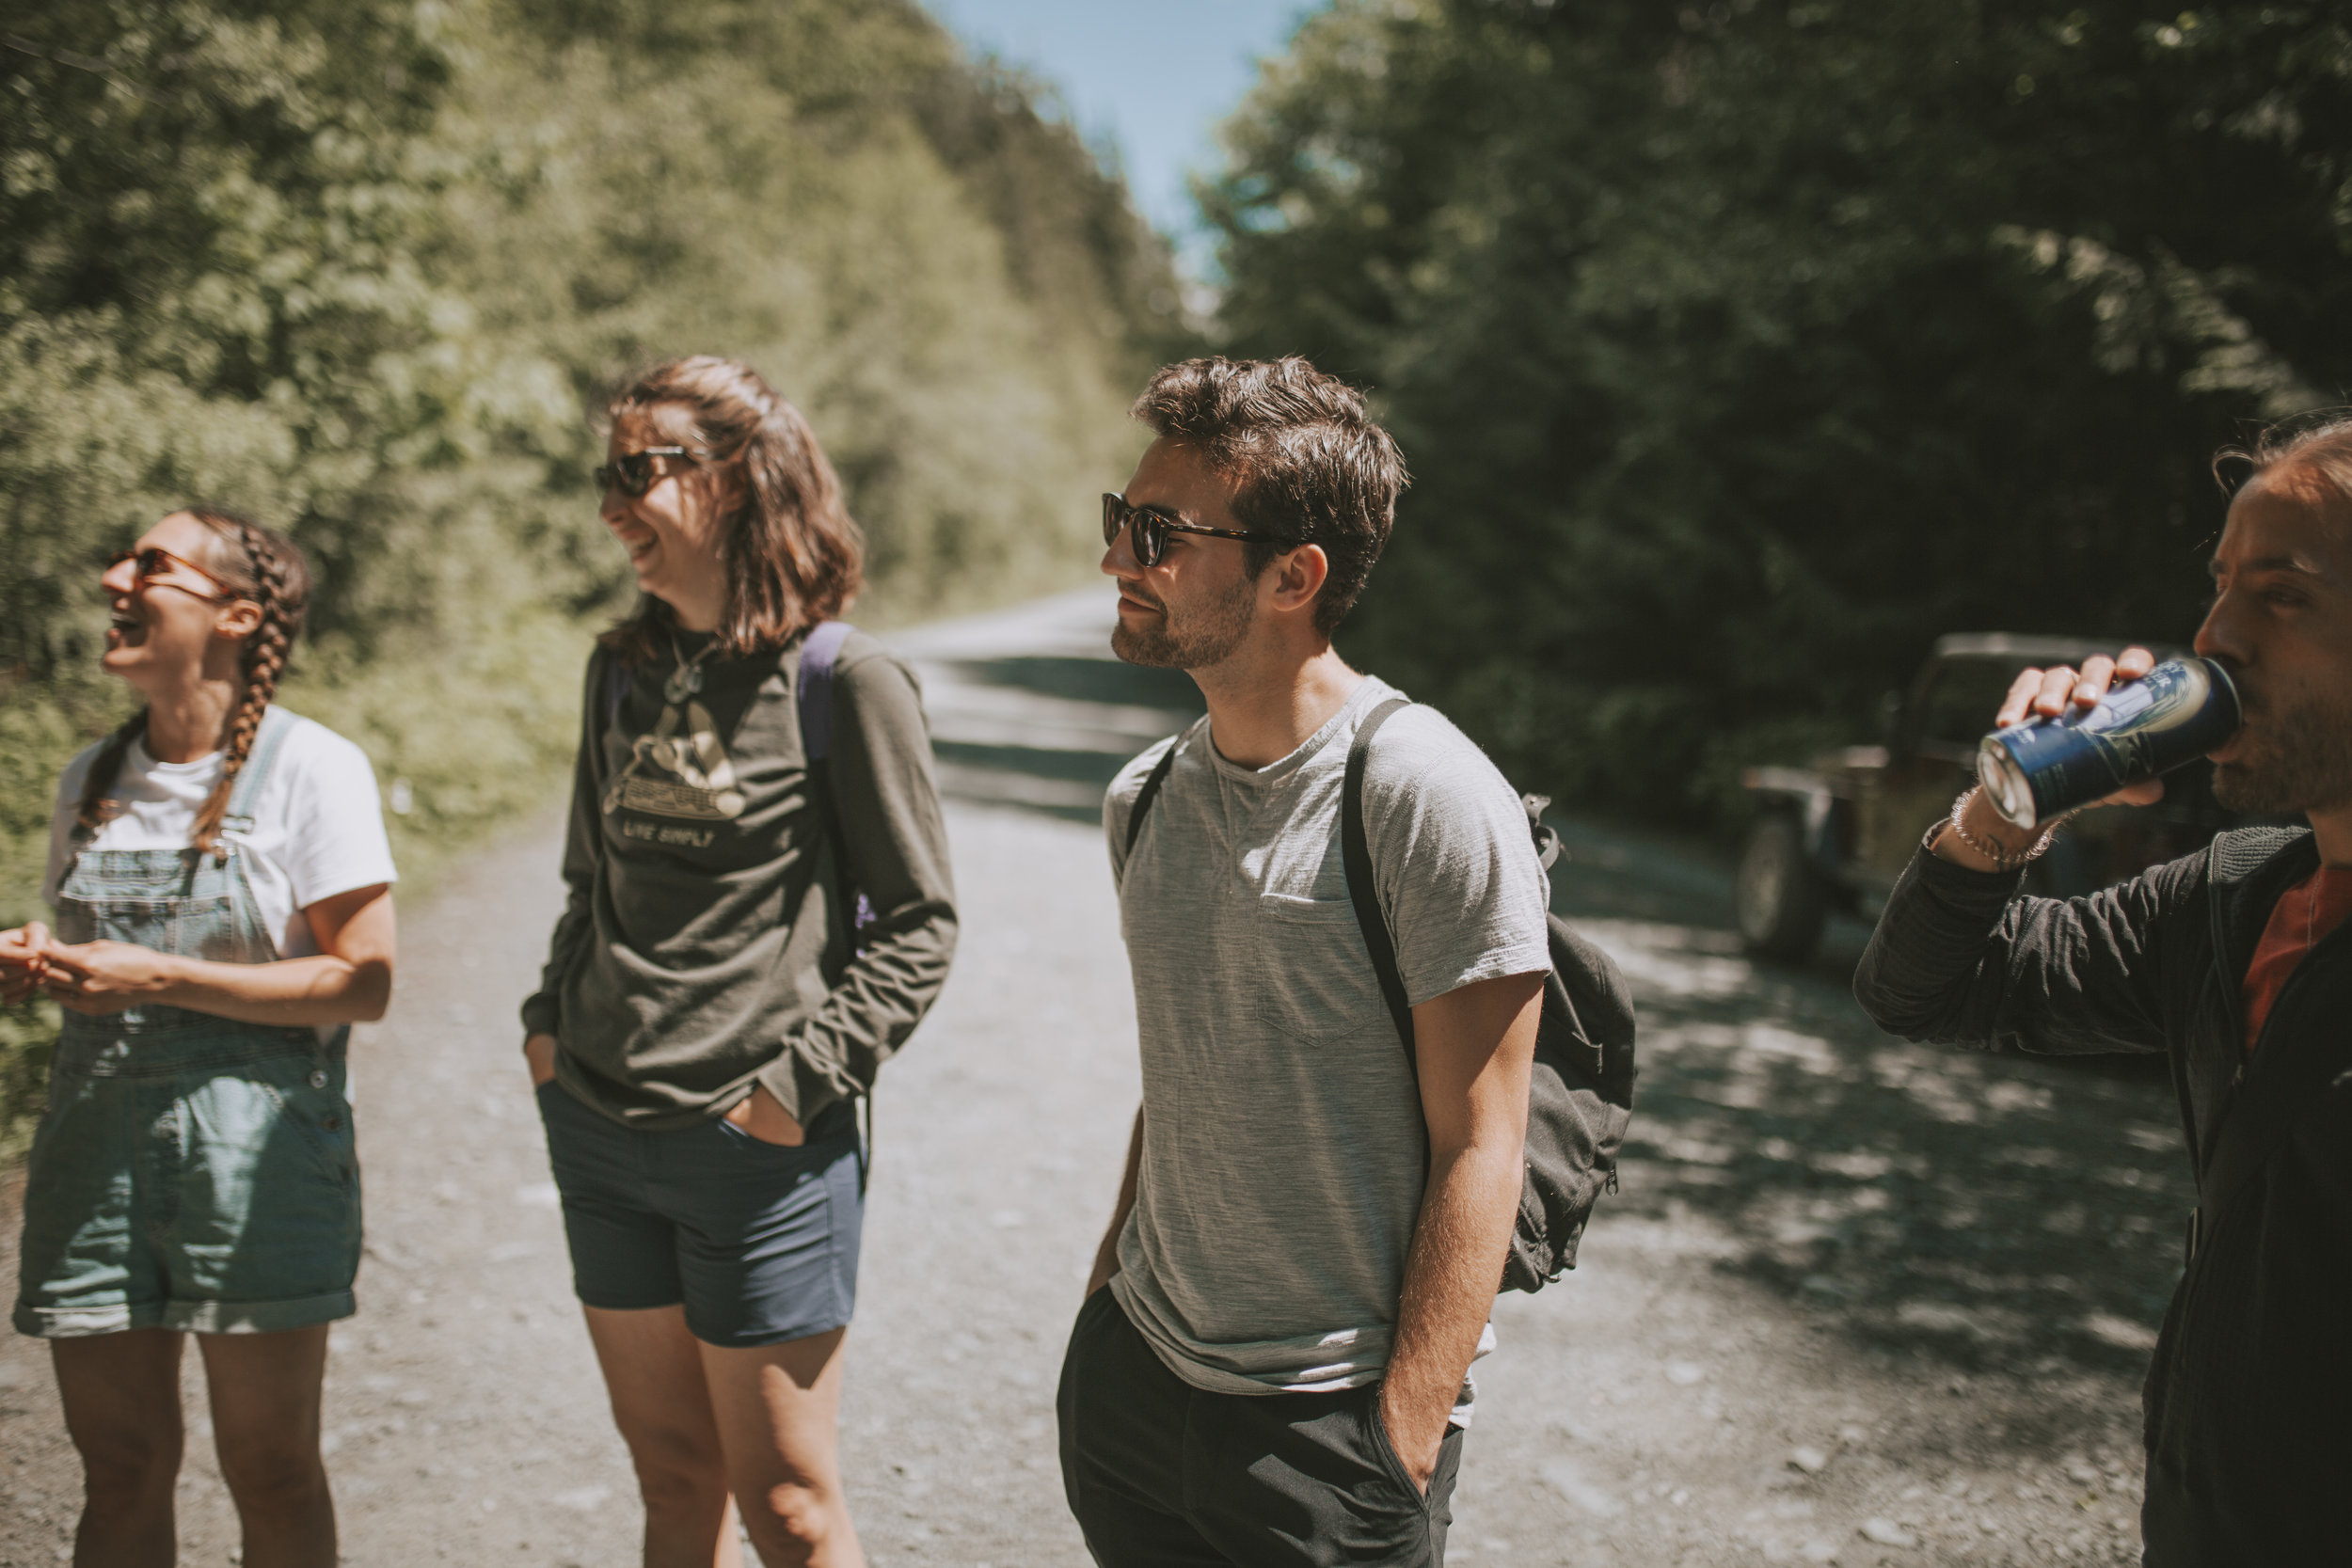 patagonia-2019-emilybeekscreative-5.jpg